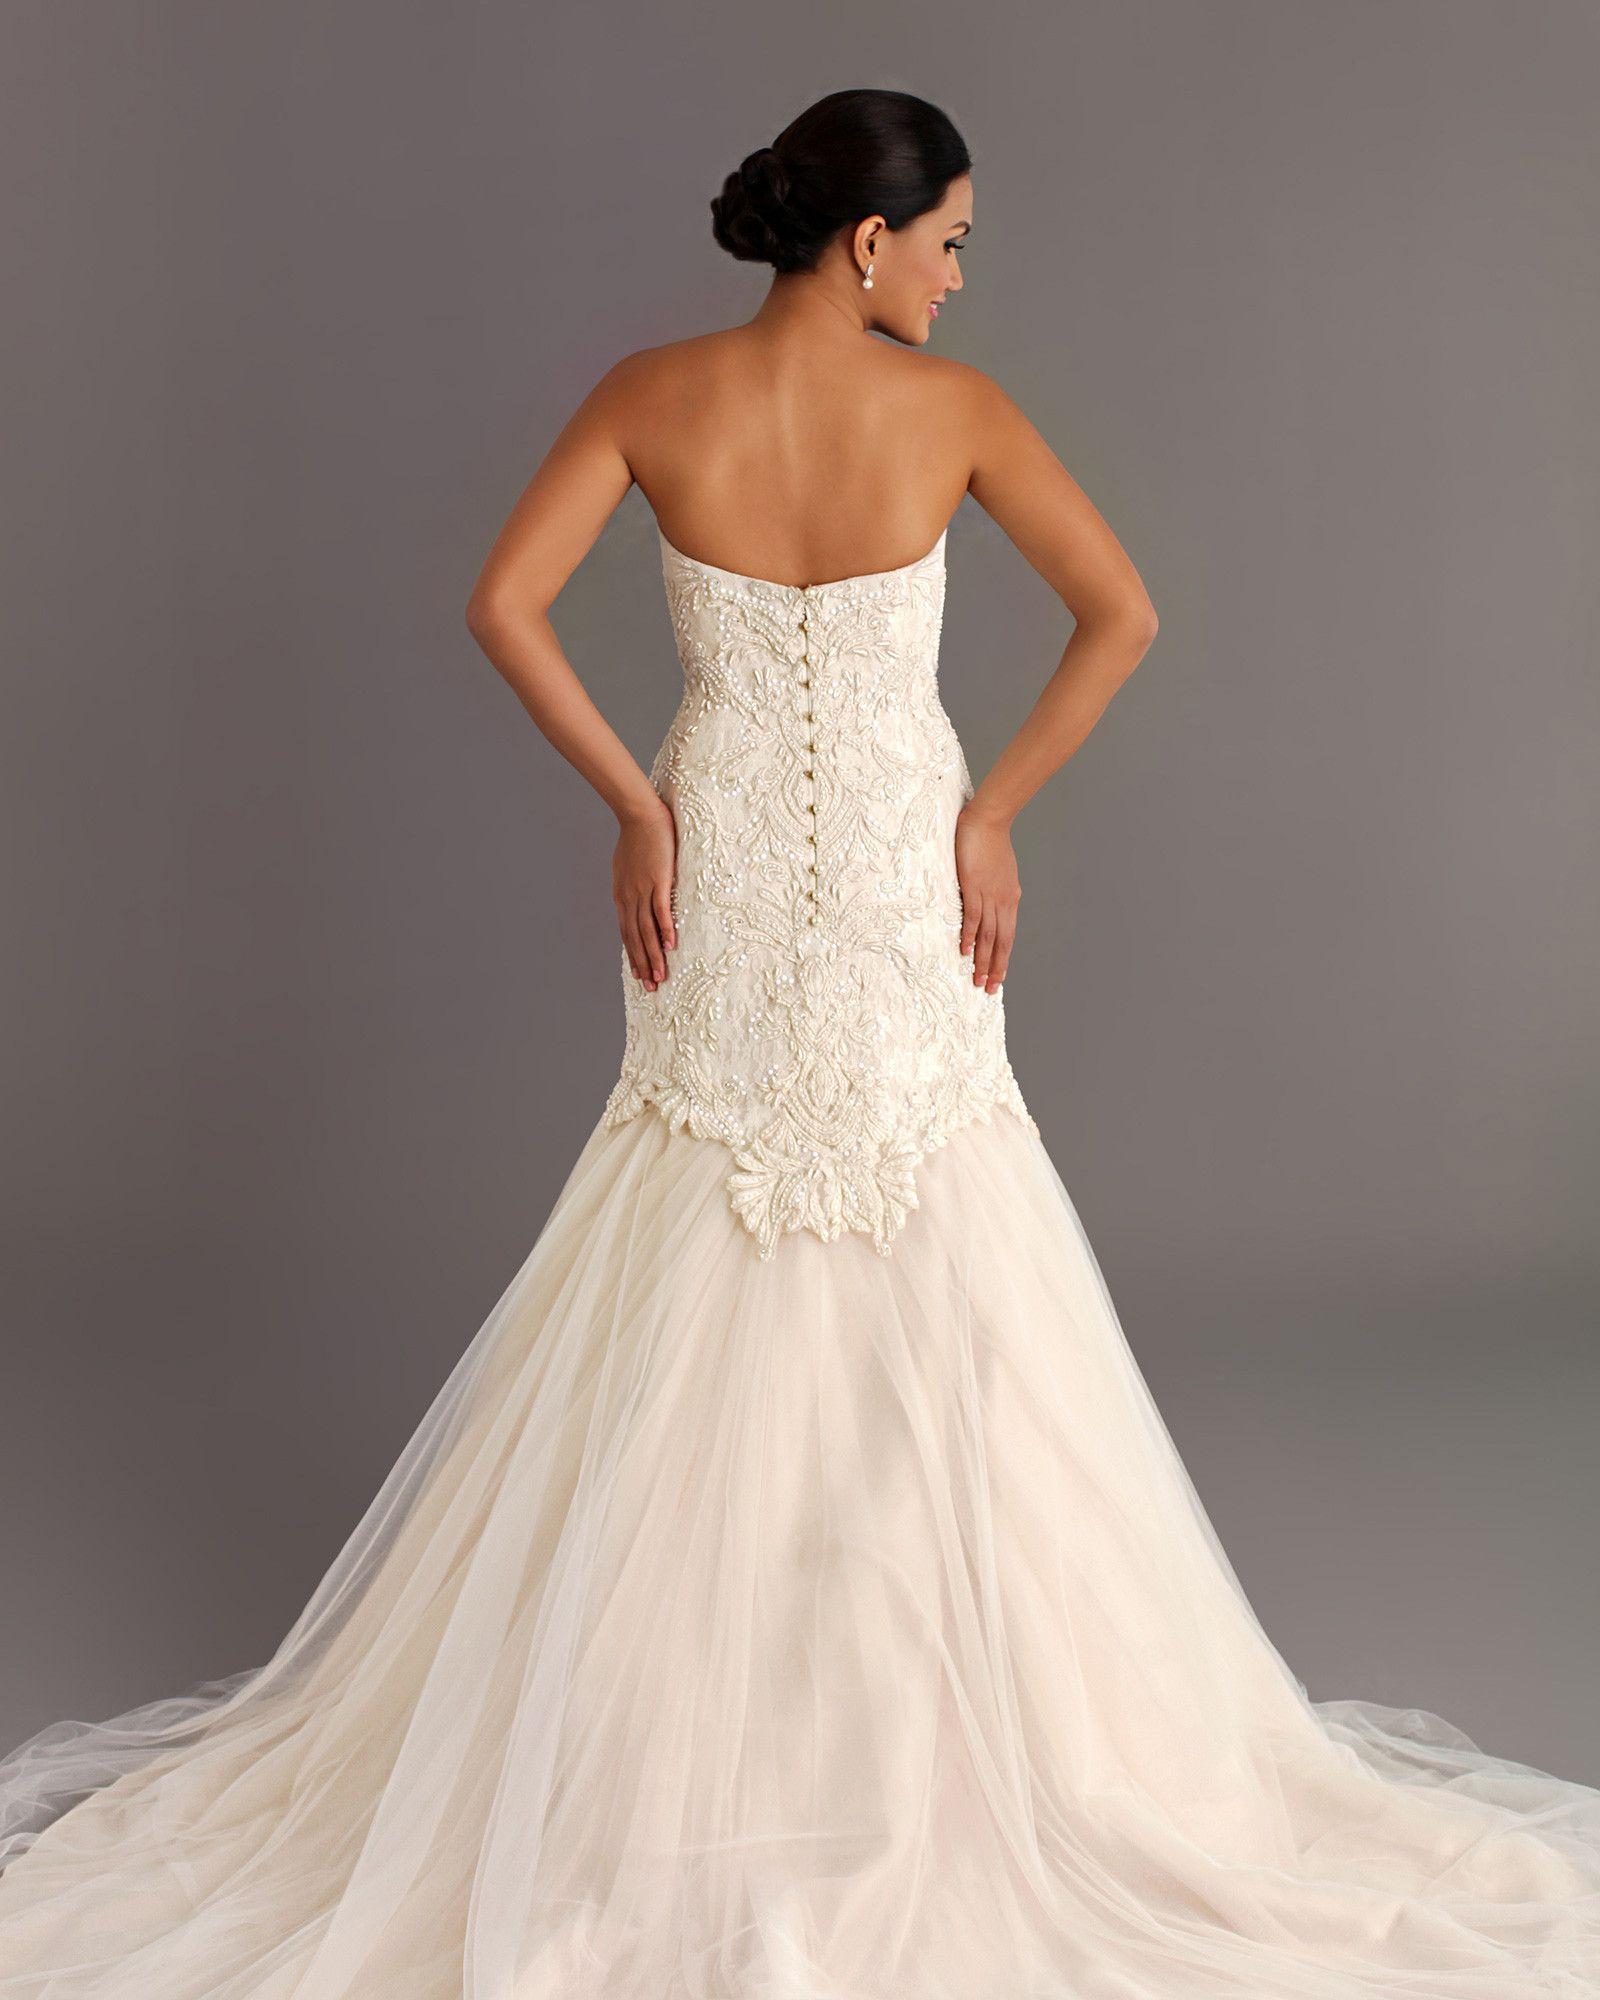 Rustica Wedding dress with veil, Bridal gowns, Wedding gowns